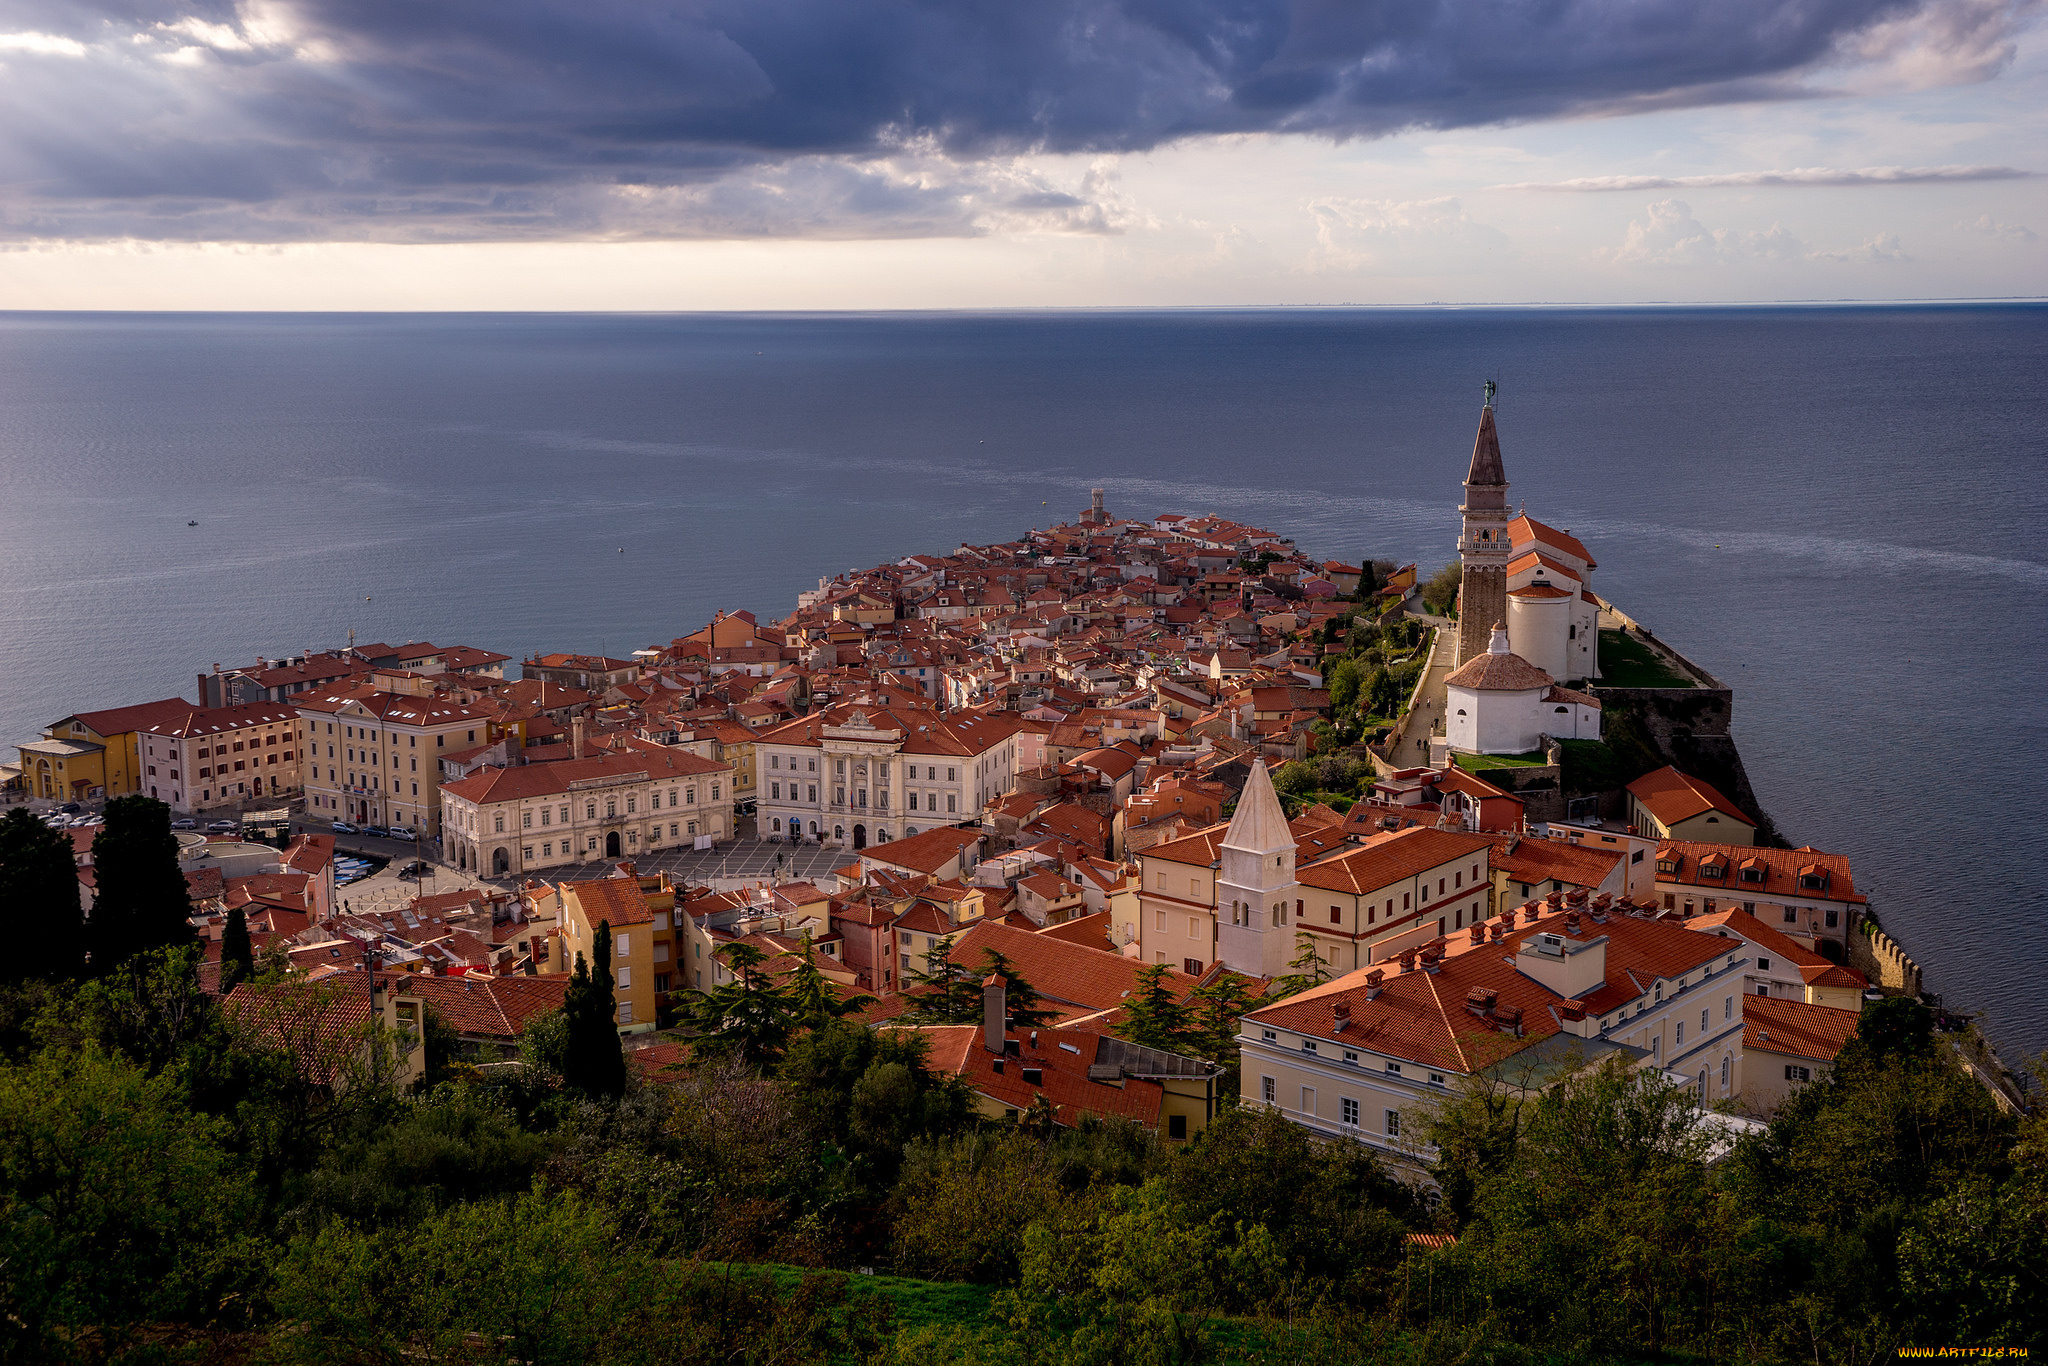 Пиран – словенская Венеция в миниатюре